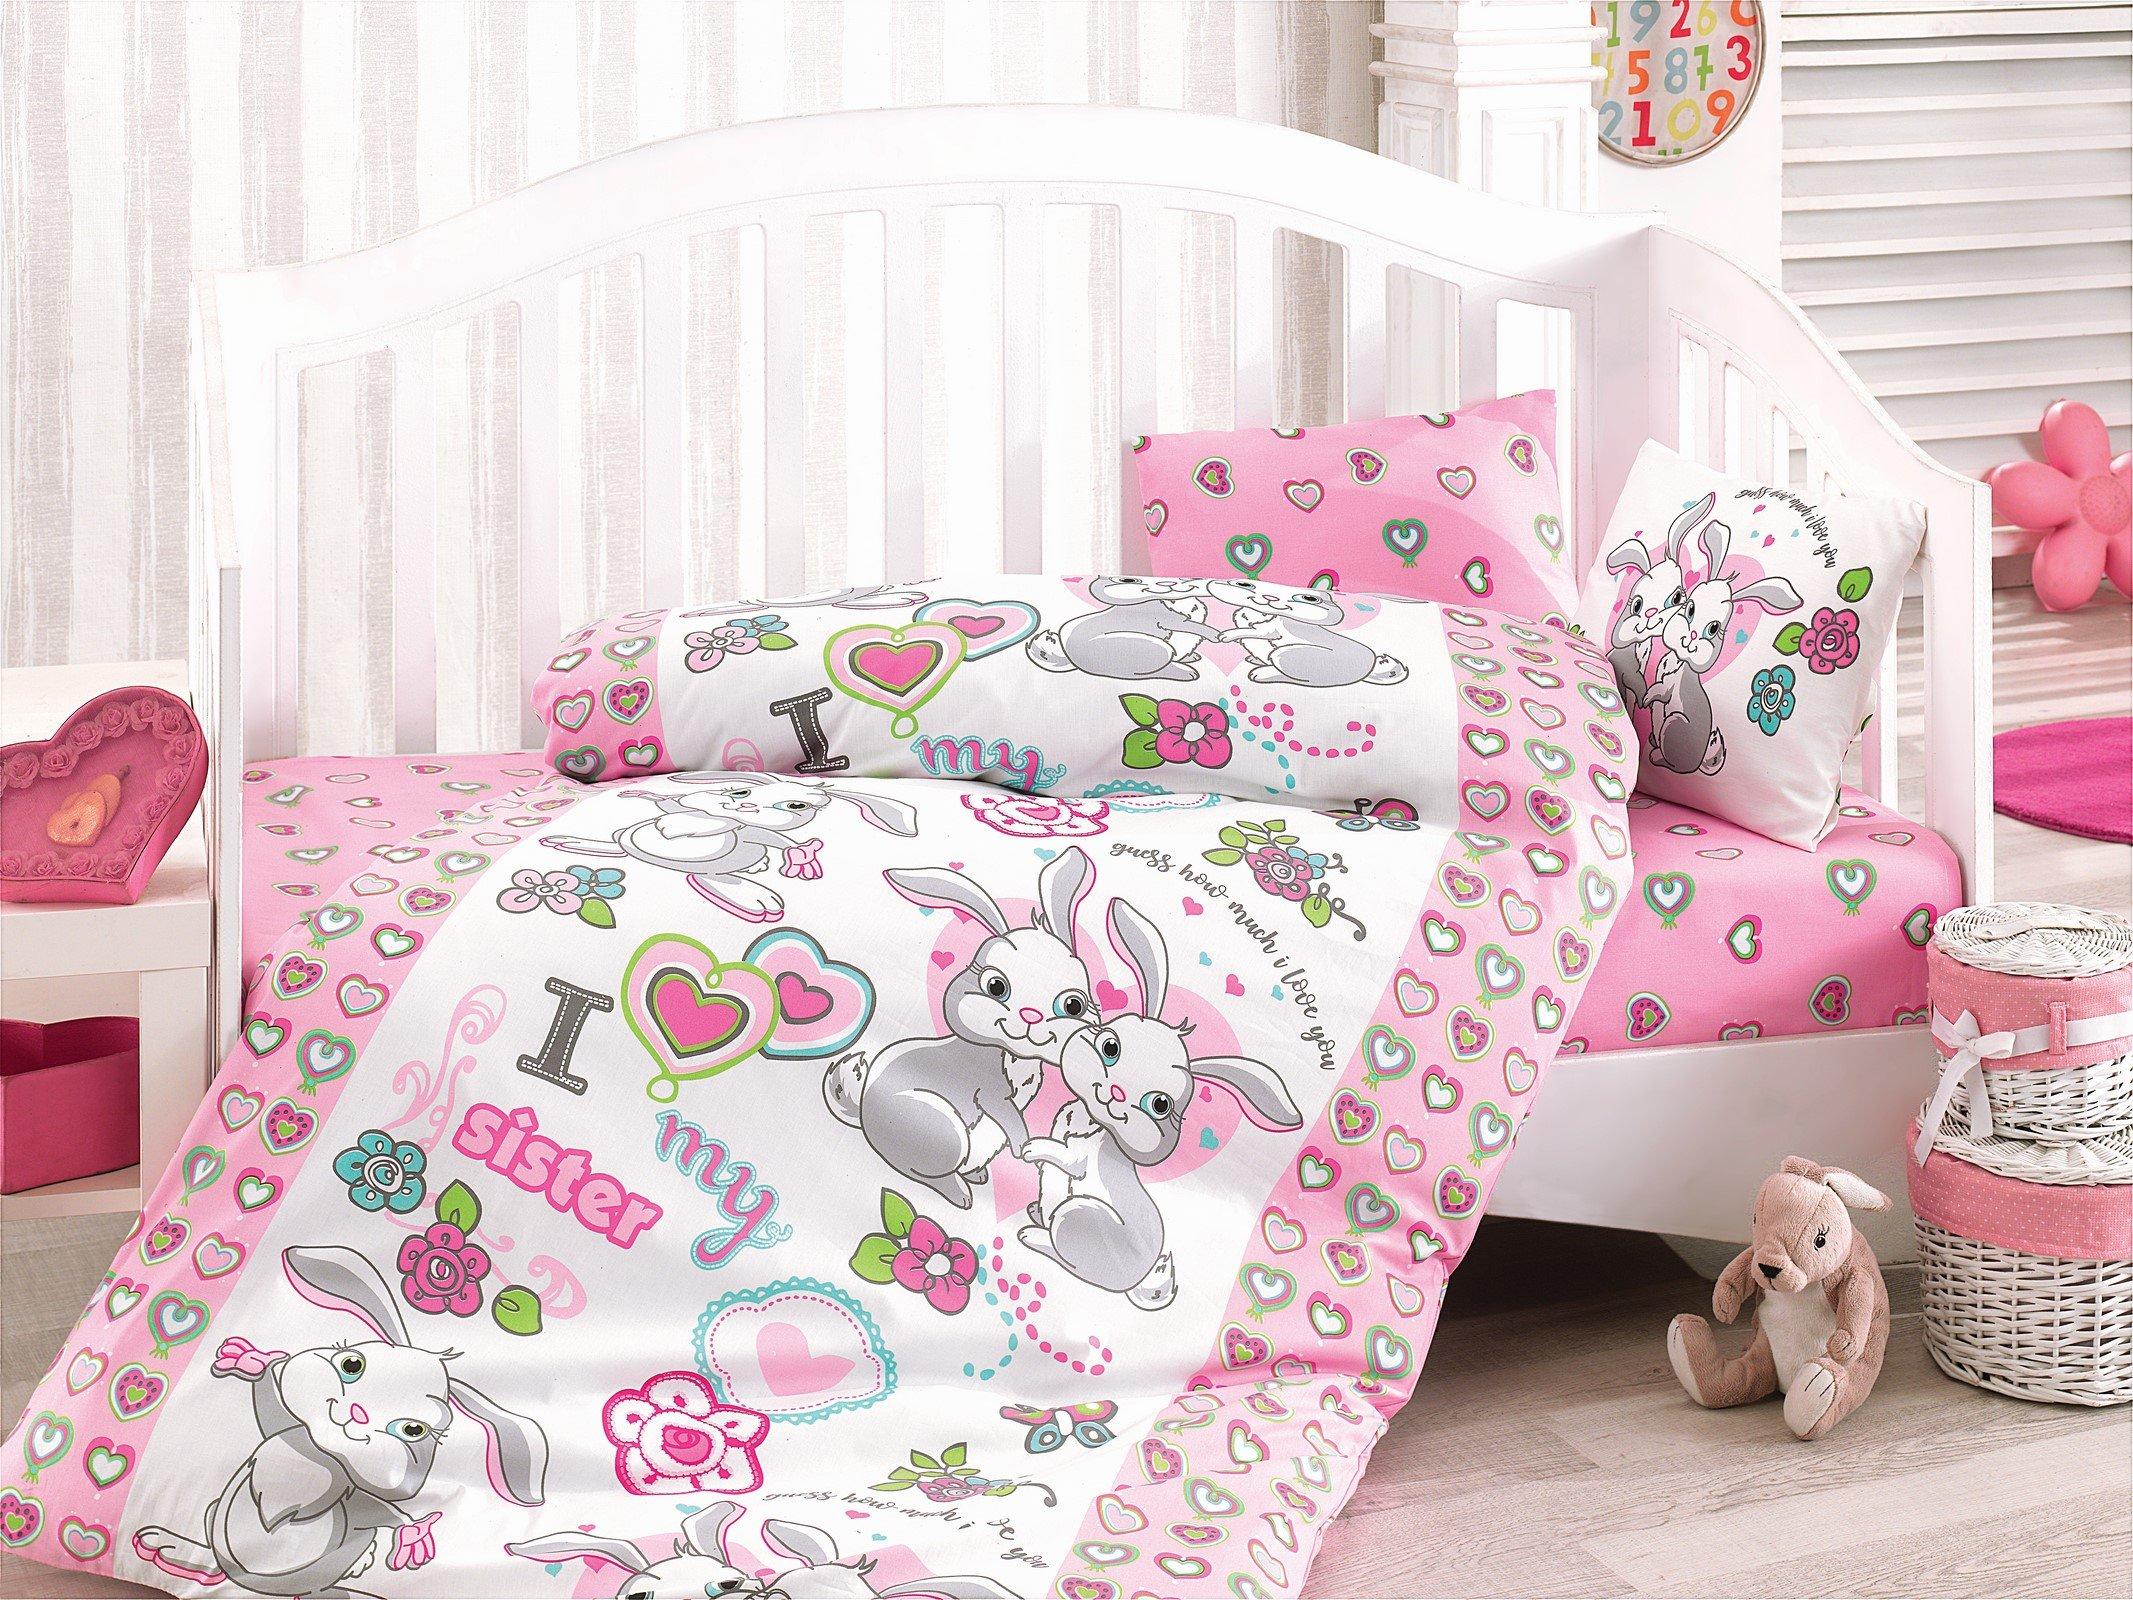 Bekata Rabbit Baby - 100% Cotton Duvet Cover Set - Toddler Bedding Set 4 Pieces by Cotton Box